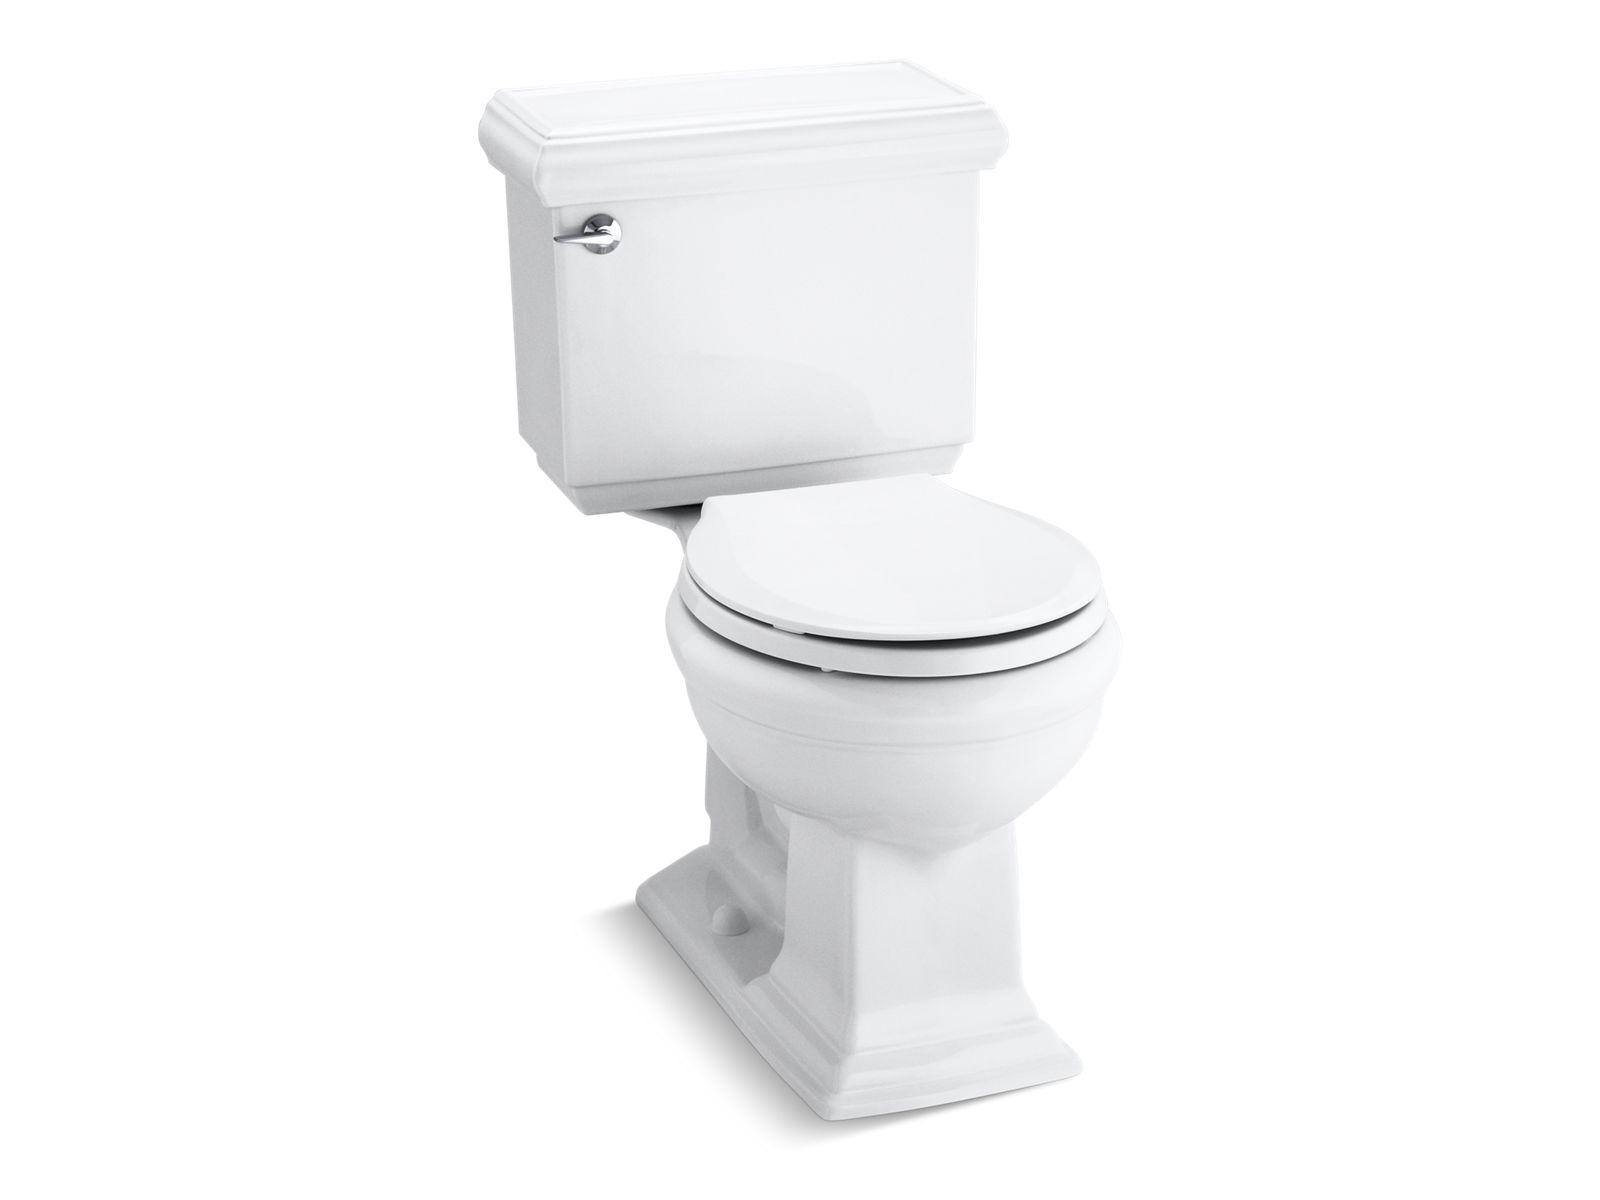 Kohler Archer Toilet Canada Cavata Tm The Complete